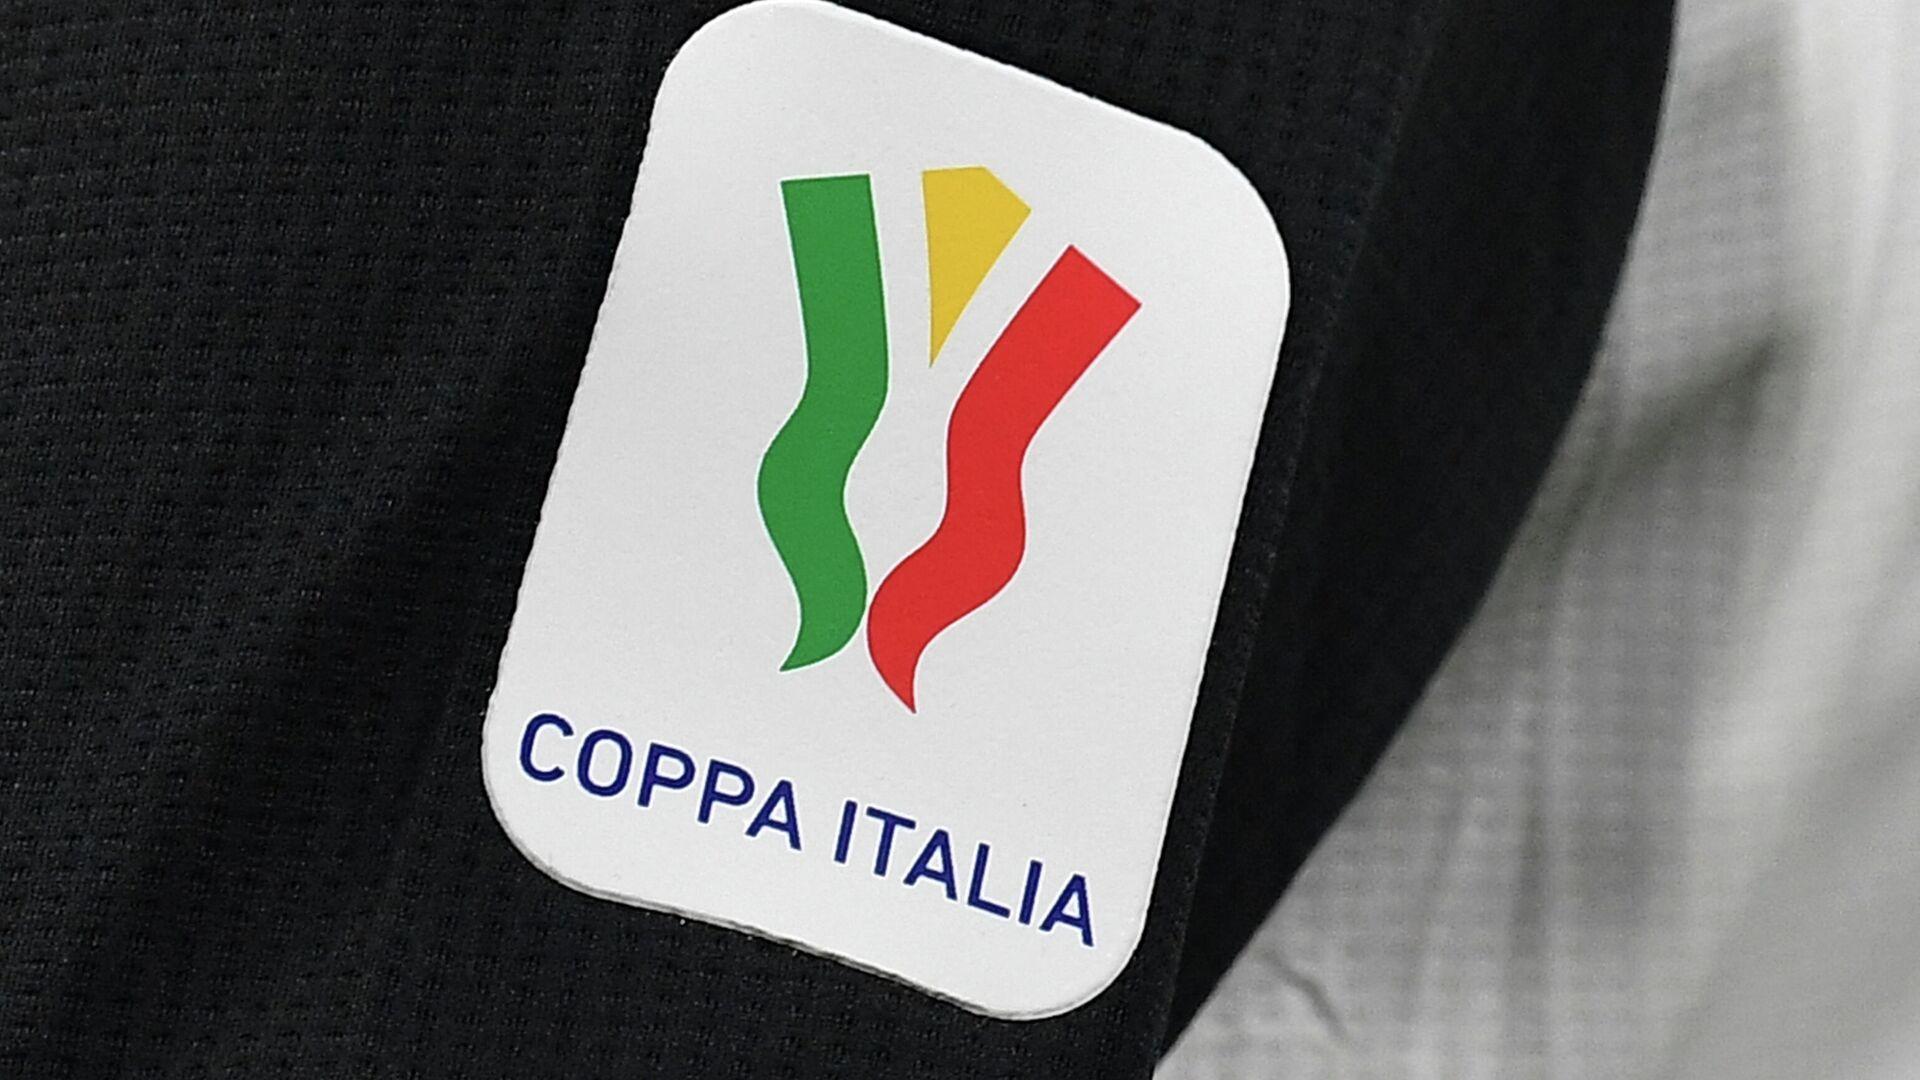 Логотип Кубка Италии по футболу - РИА Новости, 1920, 05.05.2021